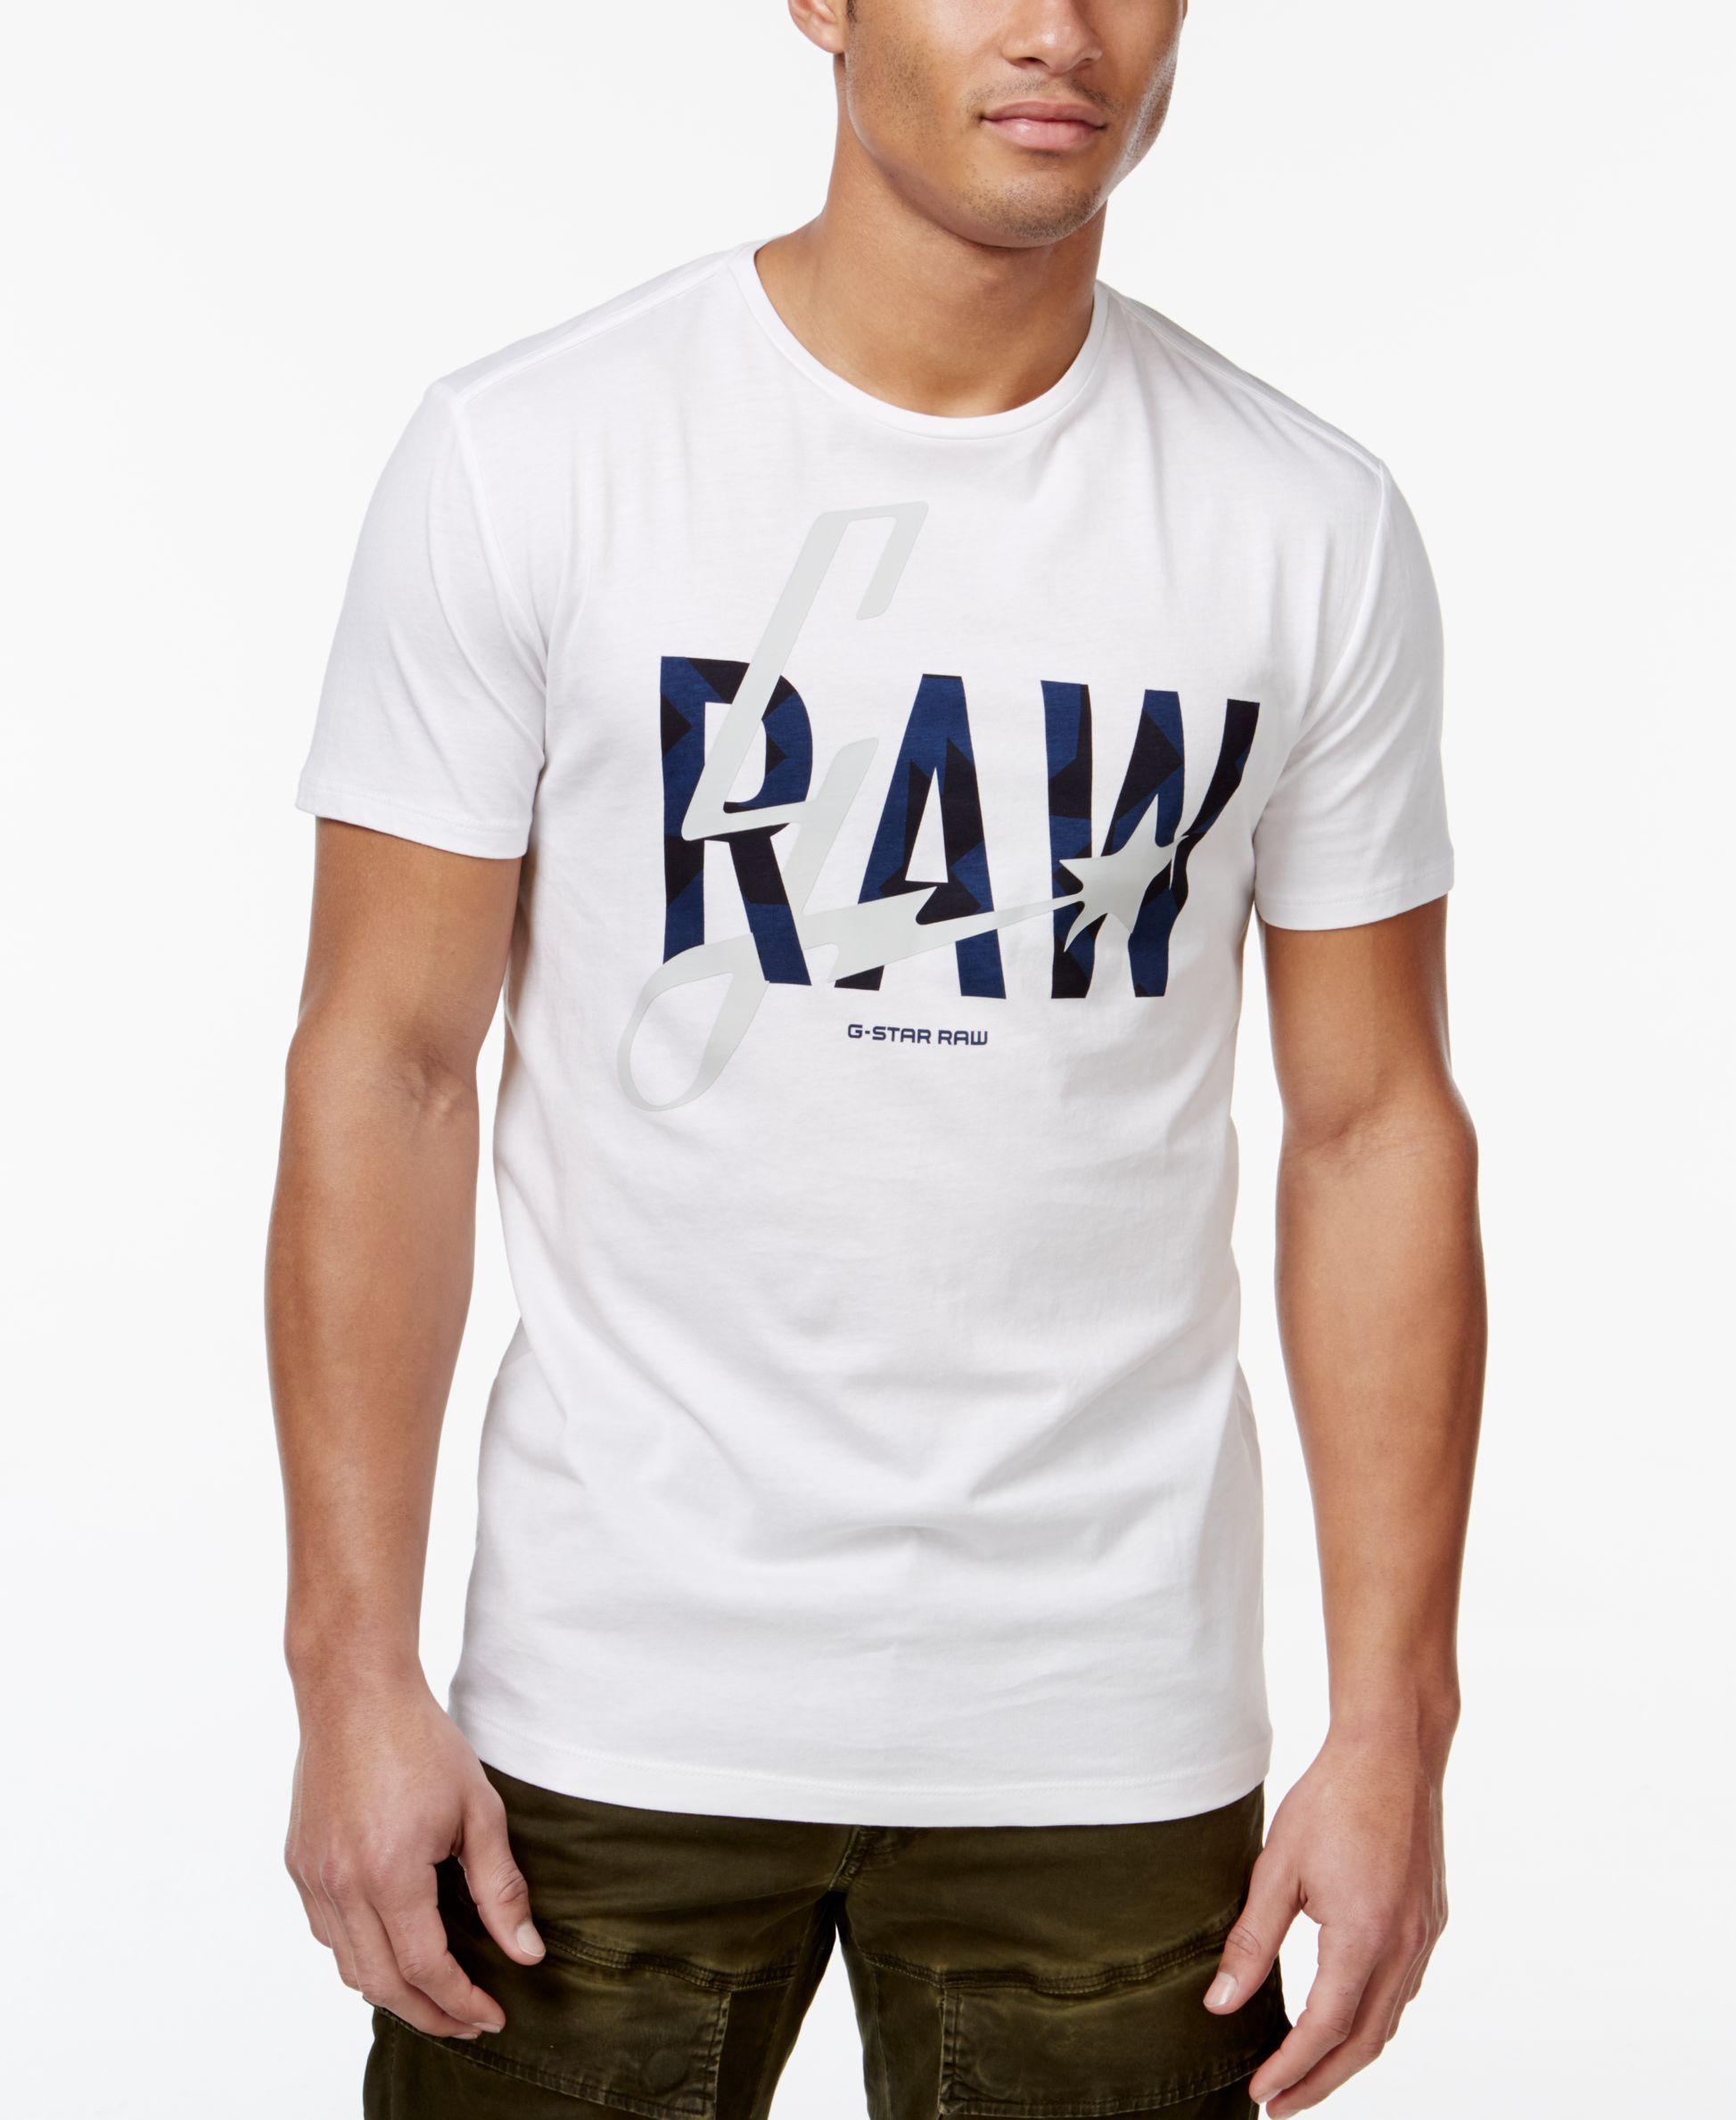 49459ccf6b G-Star Raw Logo T-Shirt | RAW ⚡ | Shirts, T shirt, Man logo